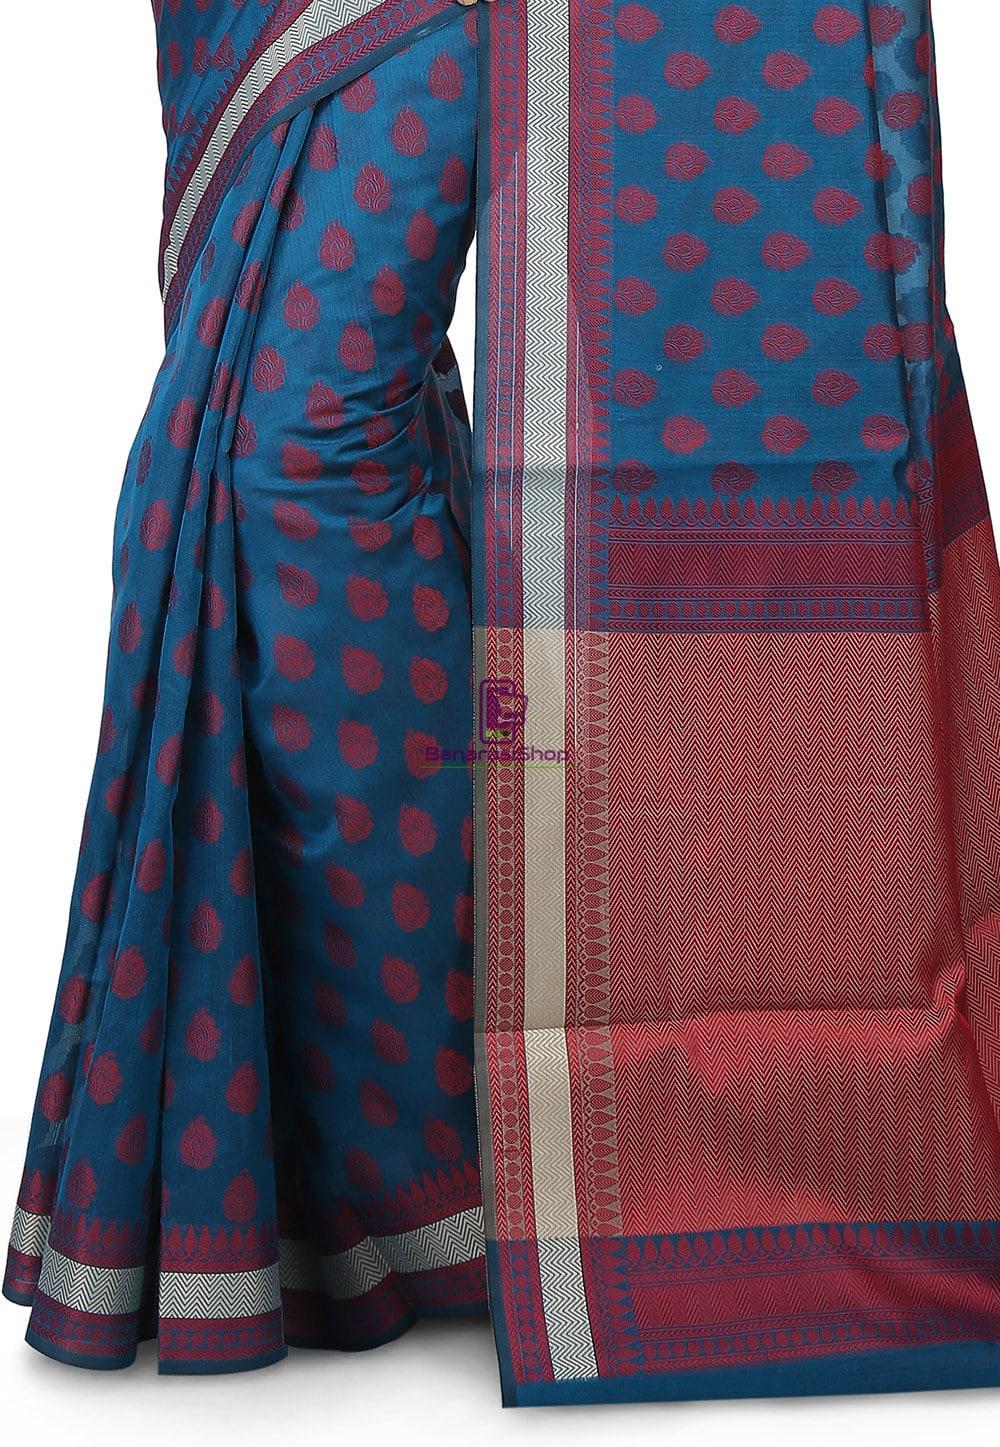 Woven Banarasi Chanderi Silk Saree in Teal Blue 2